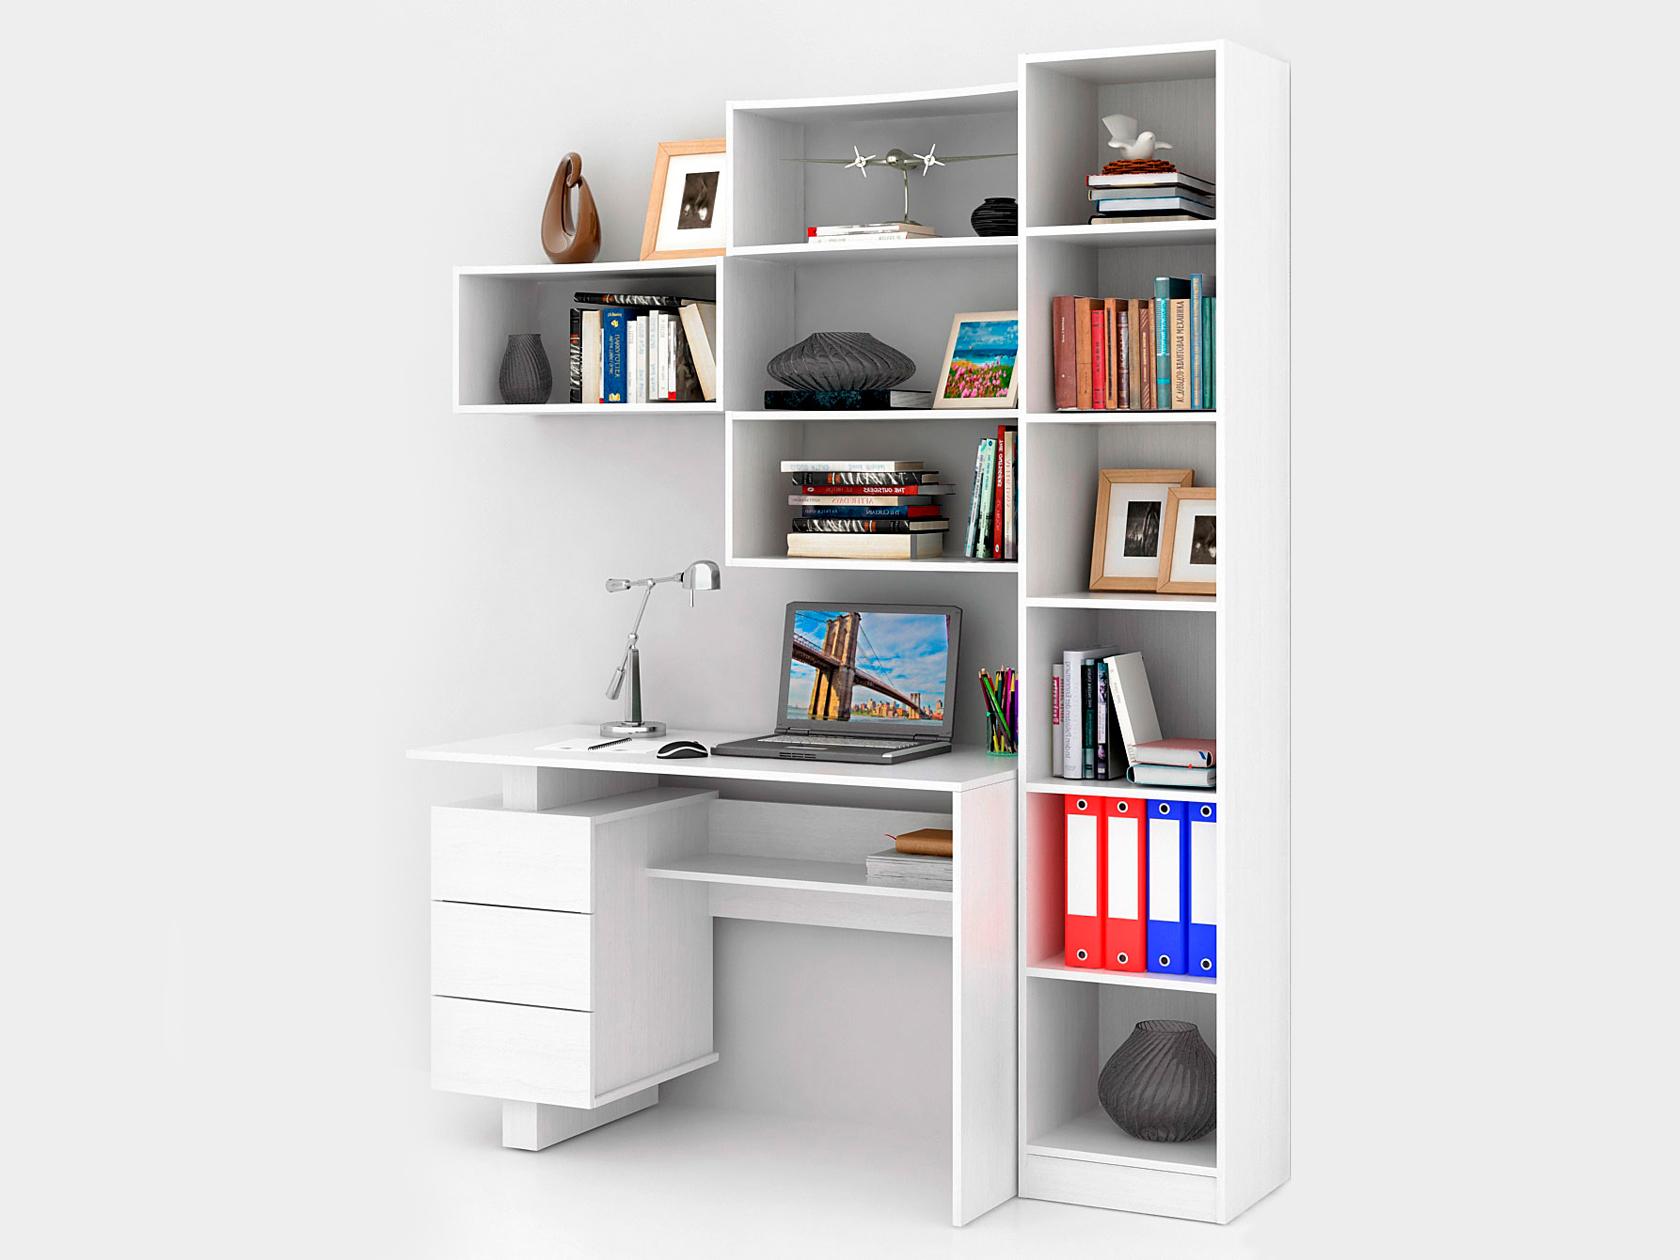 Компьютерный стол в комплекте МФ Мастер Ренцо-2+Авант-4+Вейв-7 160x60x180, белый